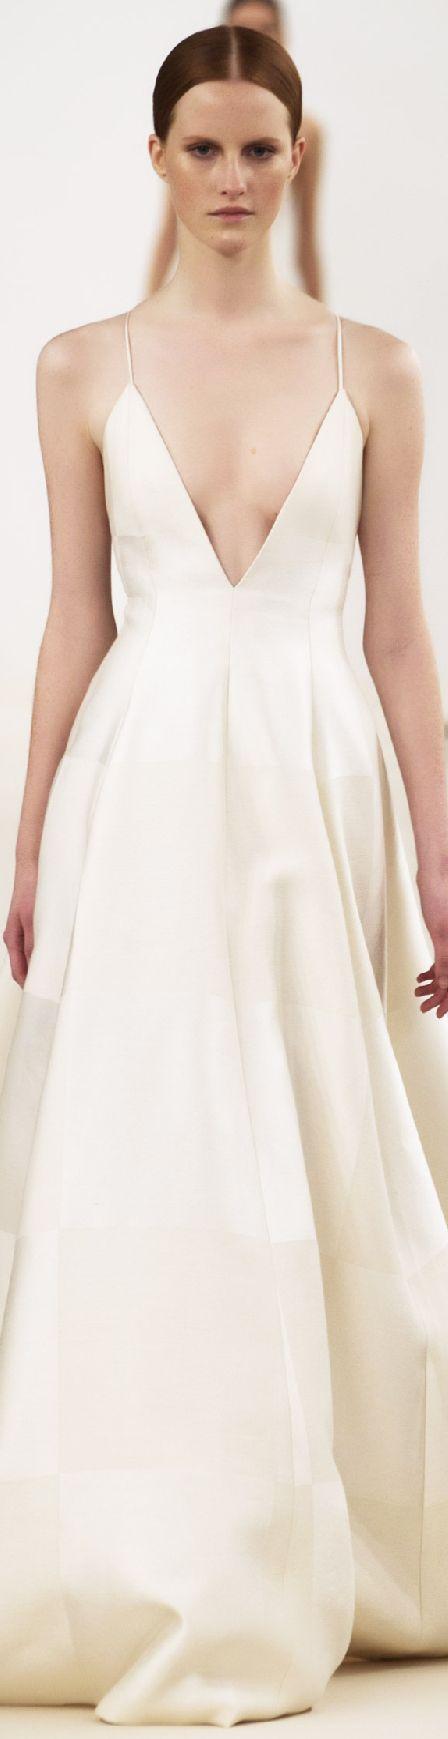 Valentino ~ Couture Spring Low V Neckline Maxi, White 2015